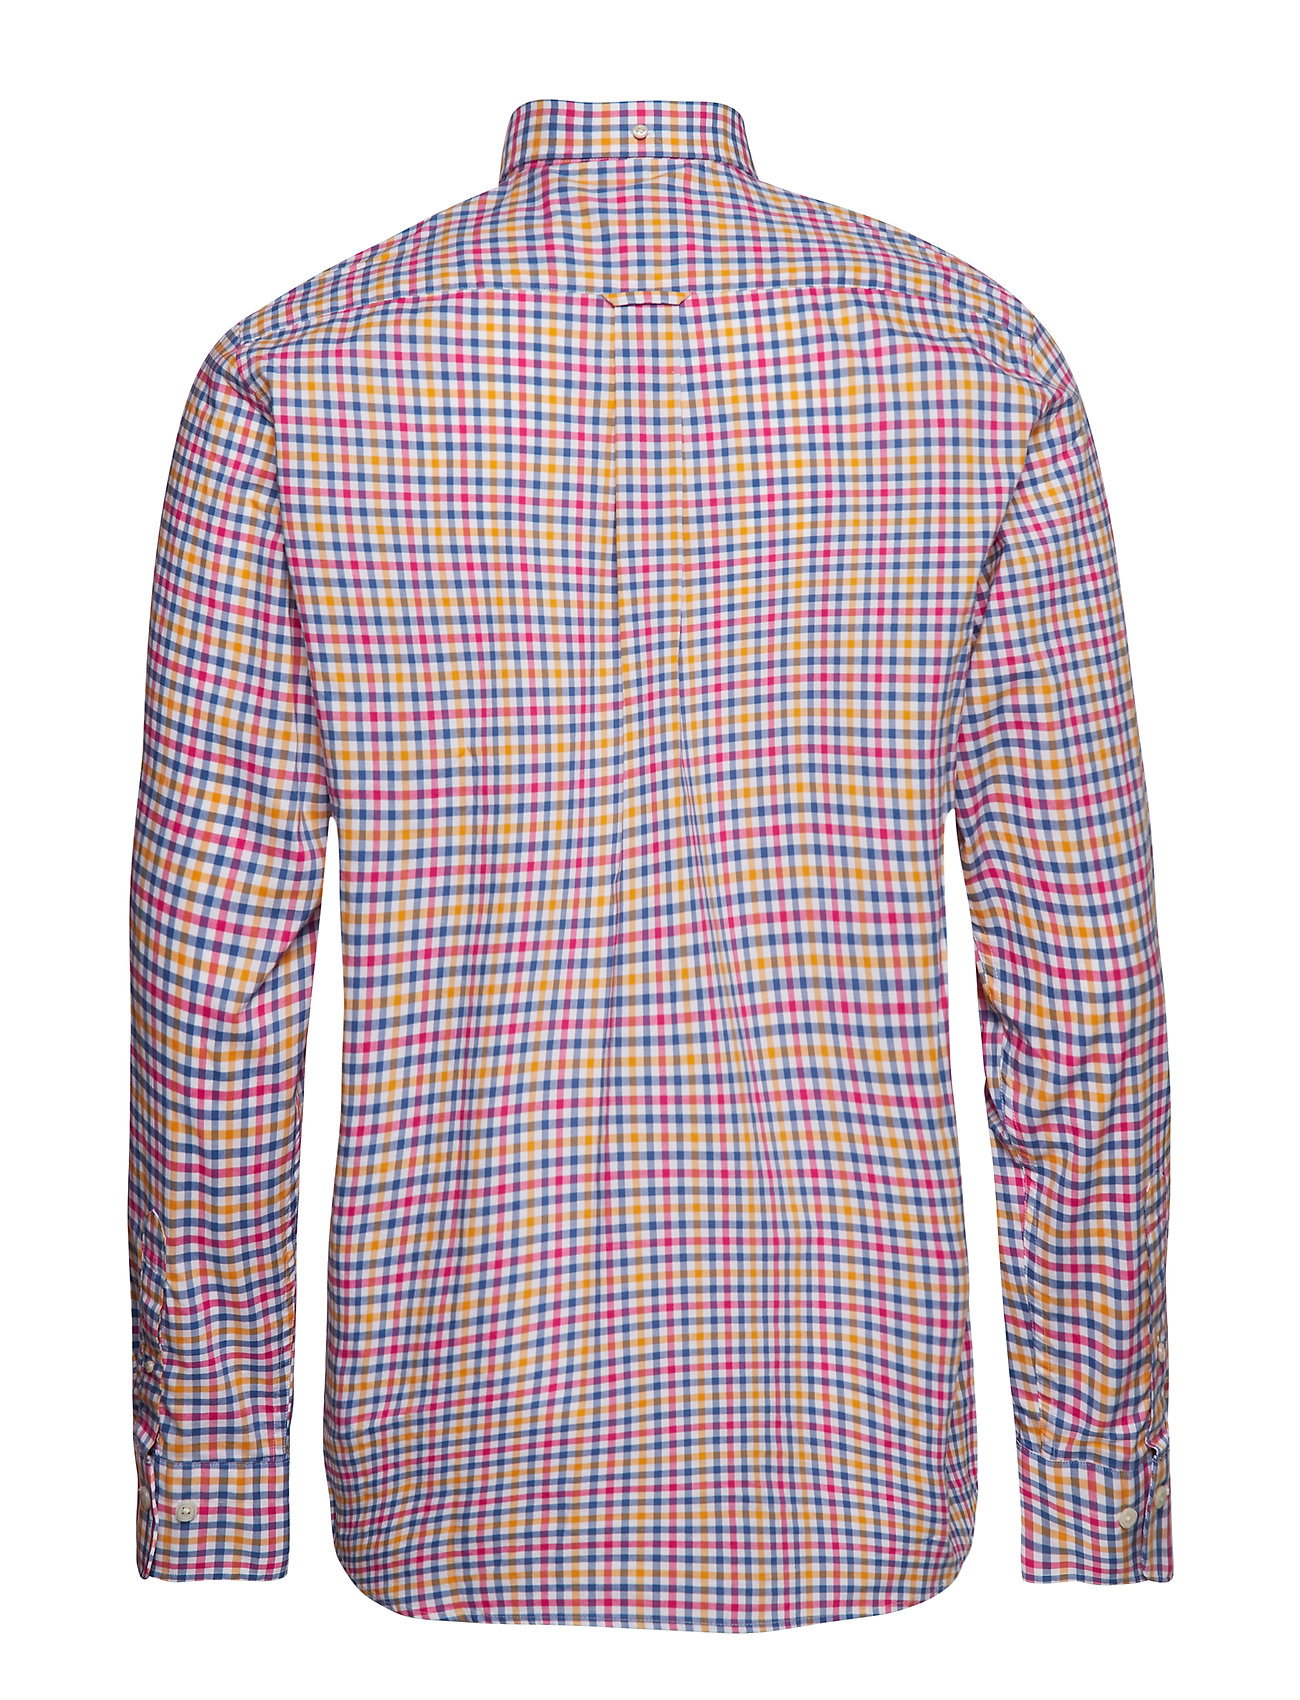 cloth 3 Gingham The Col Reg B BlueGant Bdposeidon OPkZiXTu